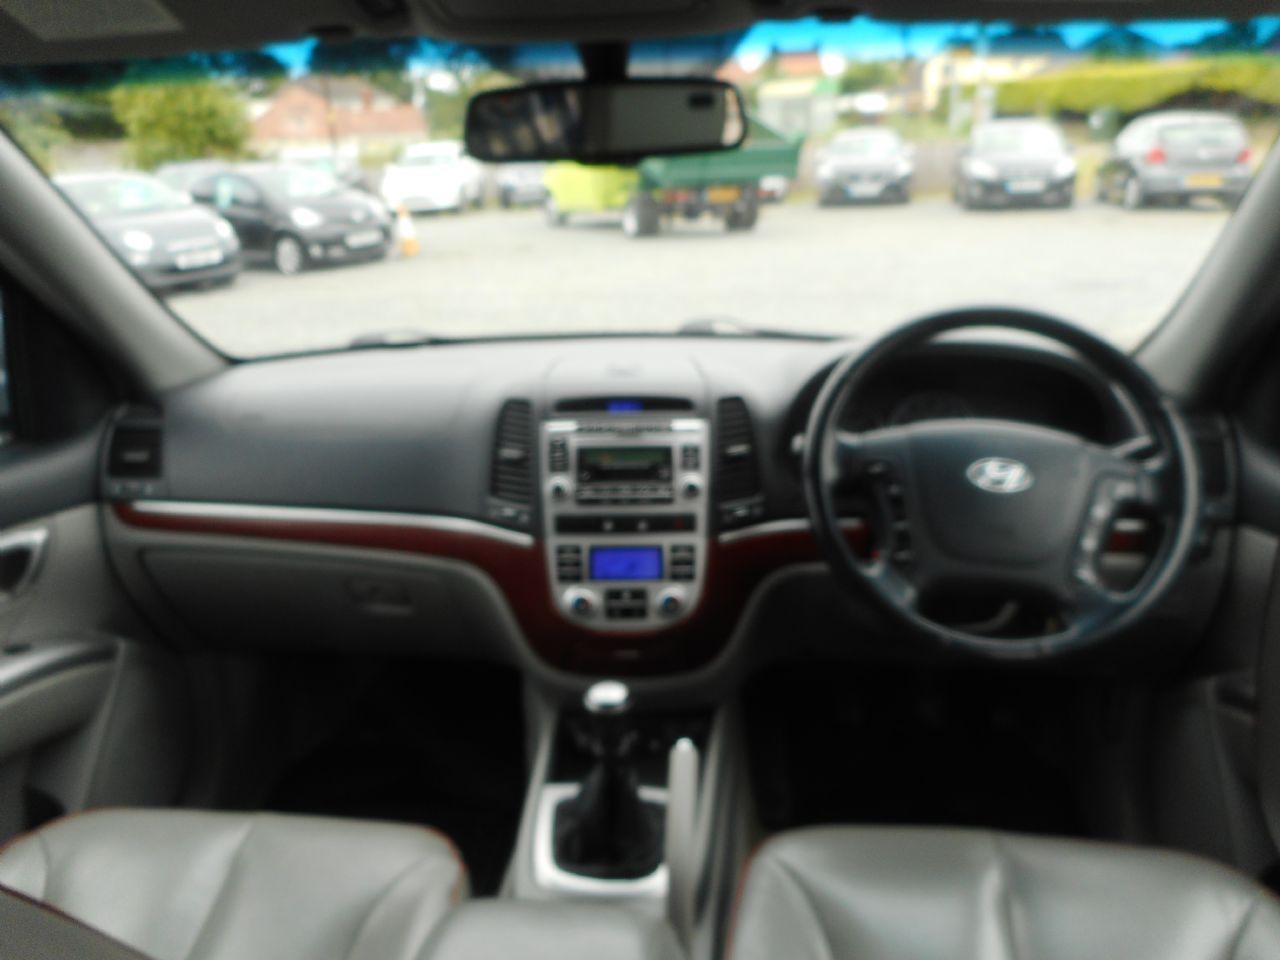 HYUNDAI Santa Fe 2.2 CRTD CDX 5 Seat EU4 (2008) - Picture 13